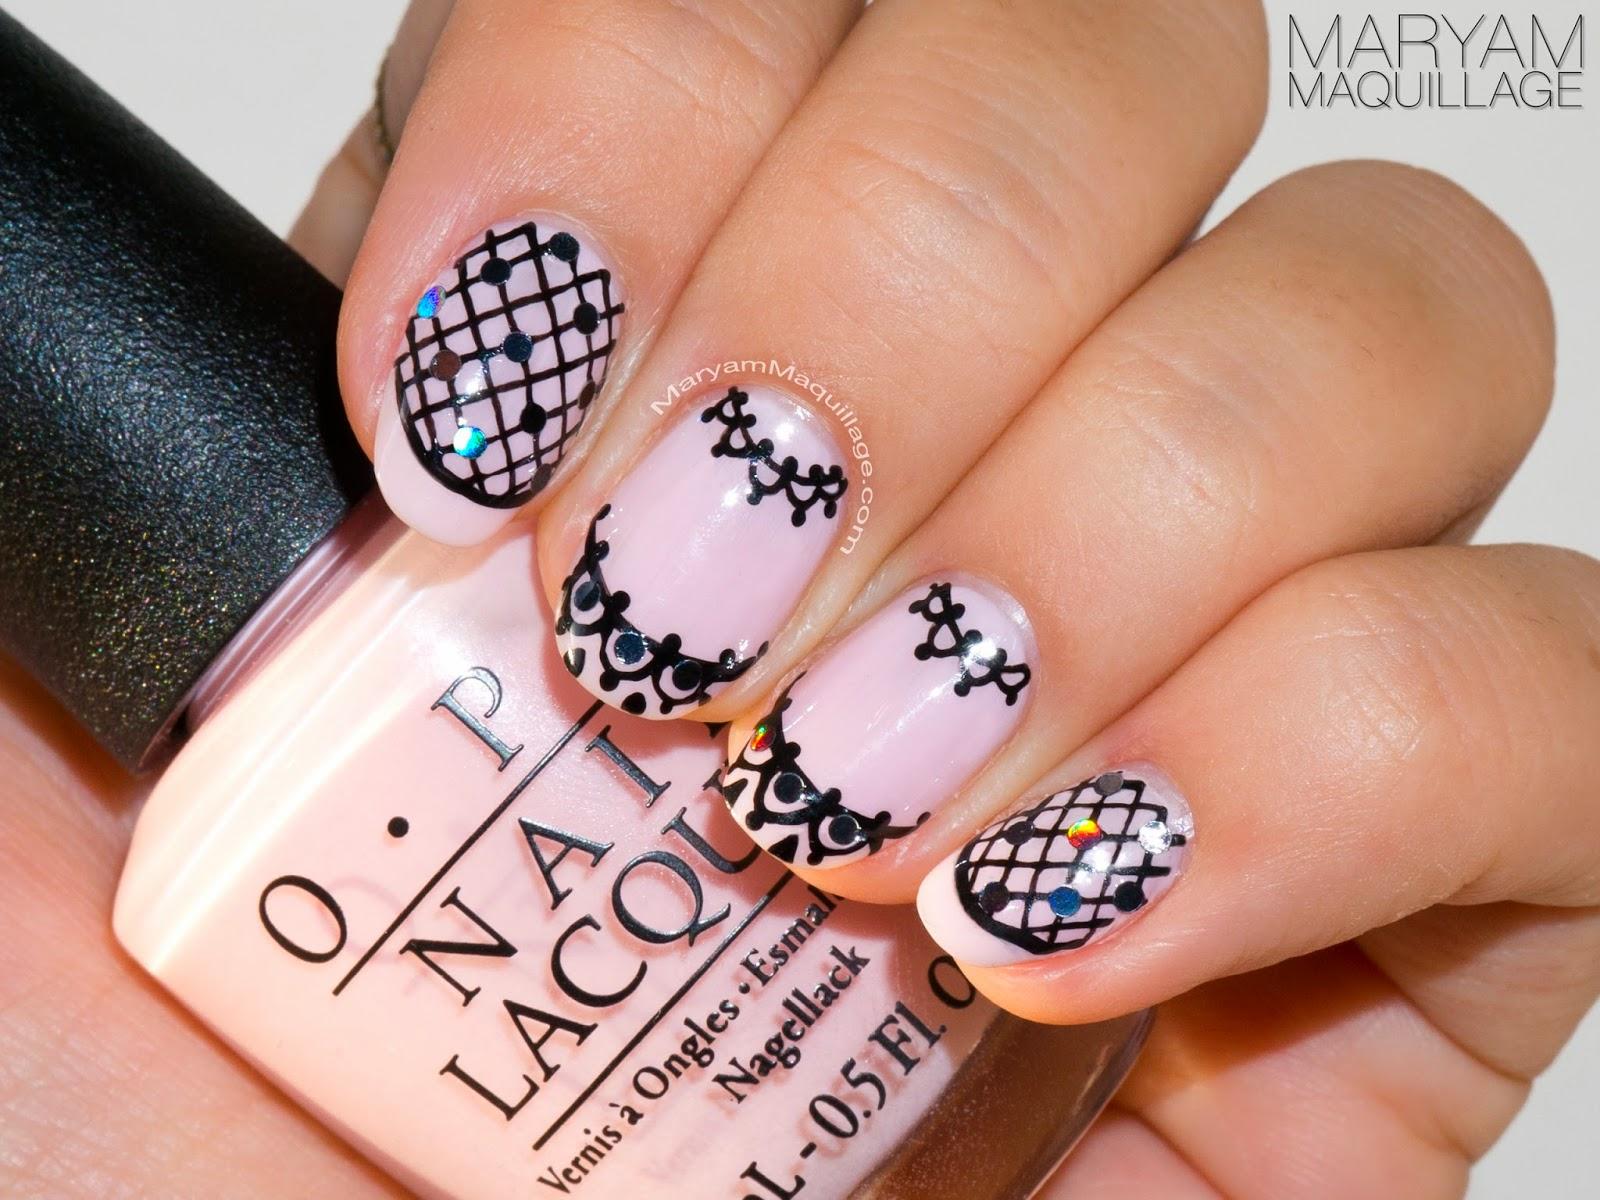 Drawn nail lace Black Nail Maquillage Design art